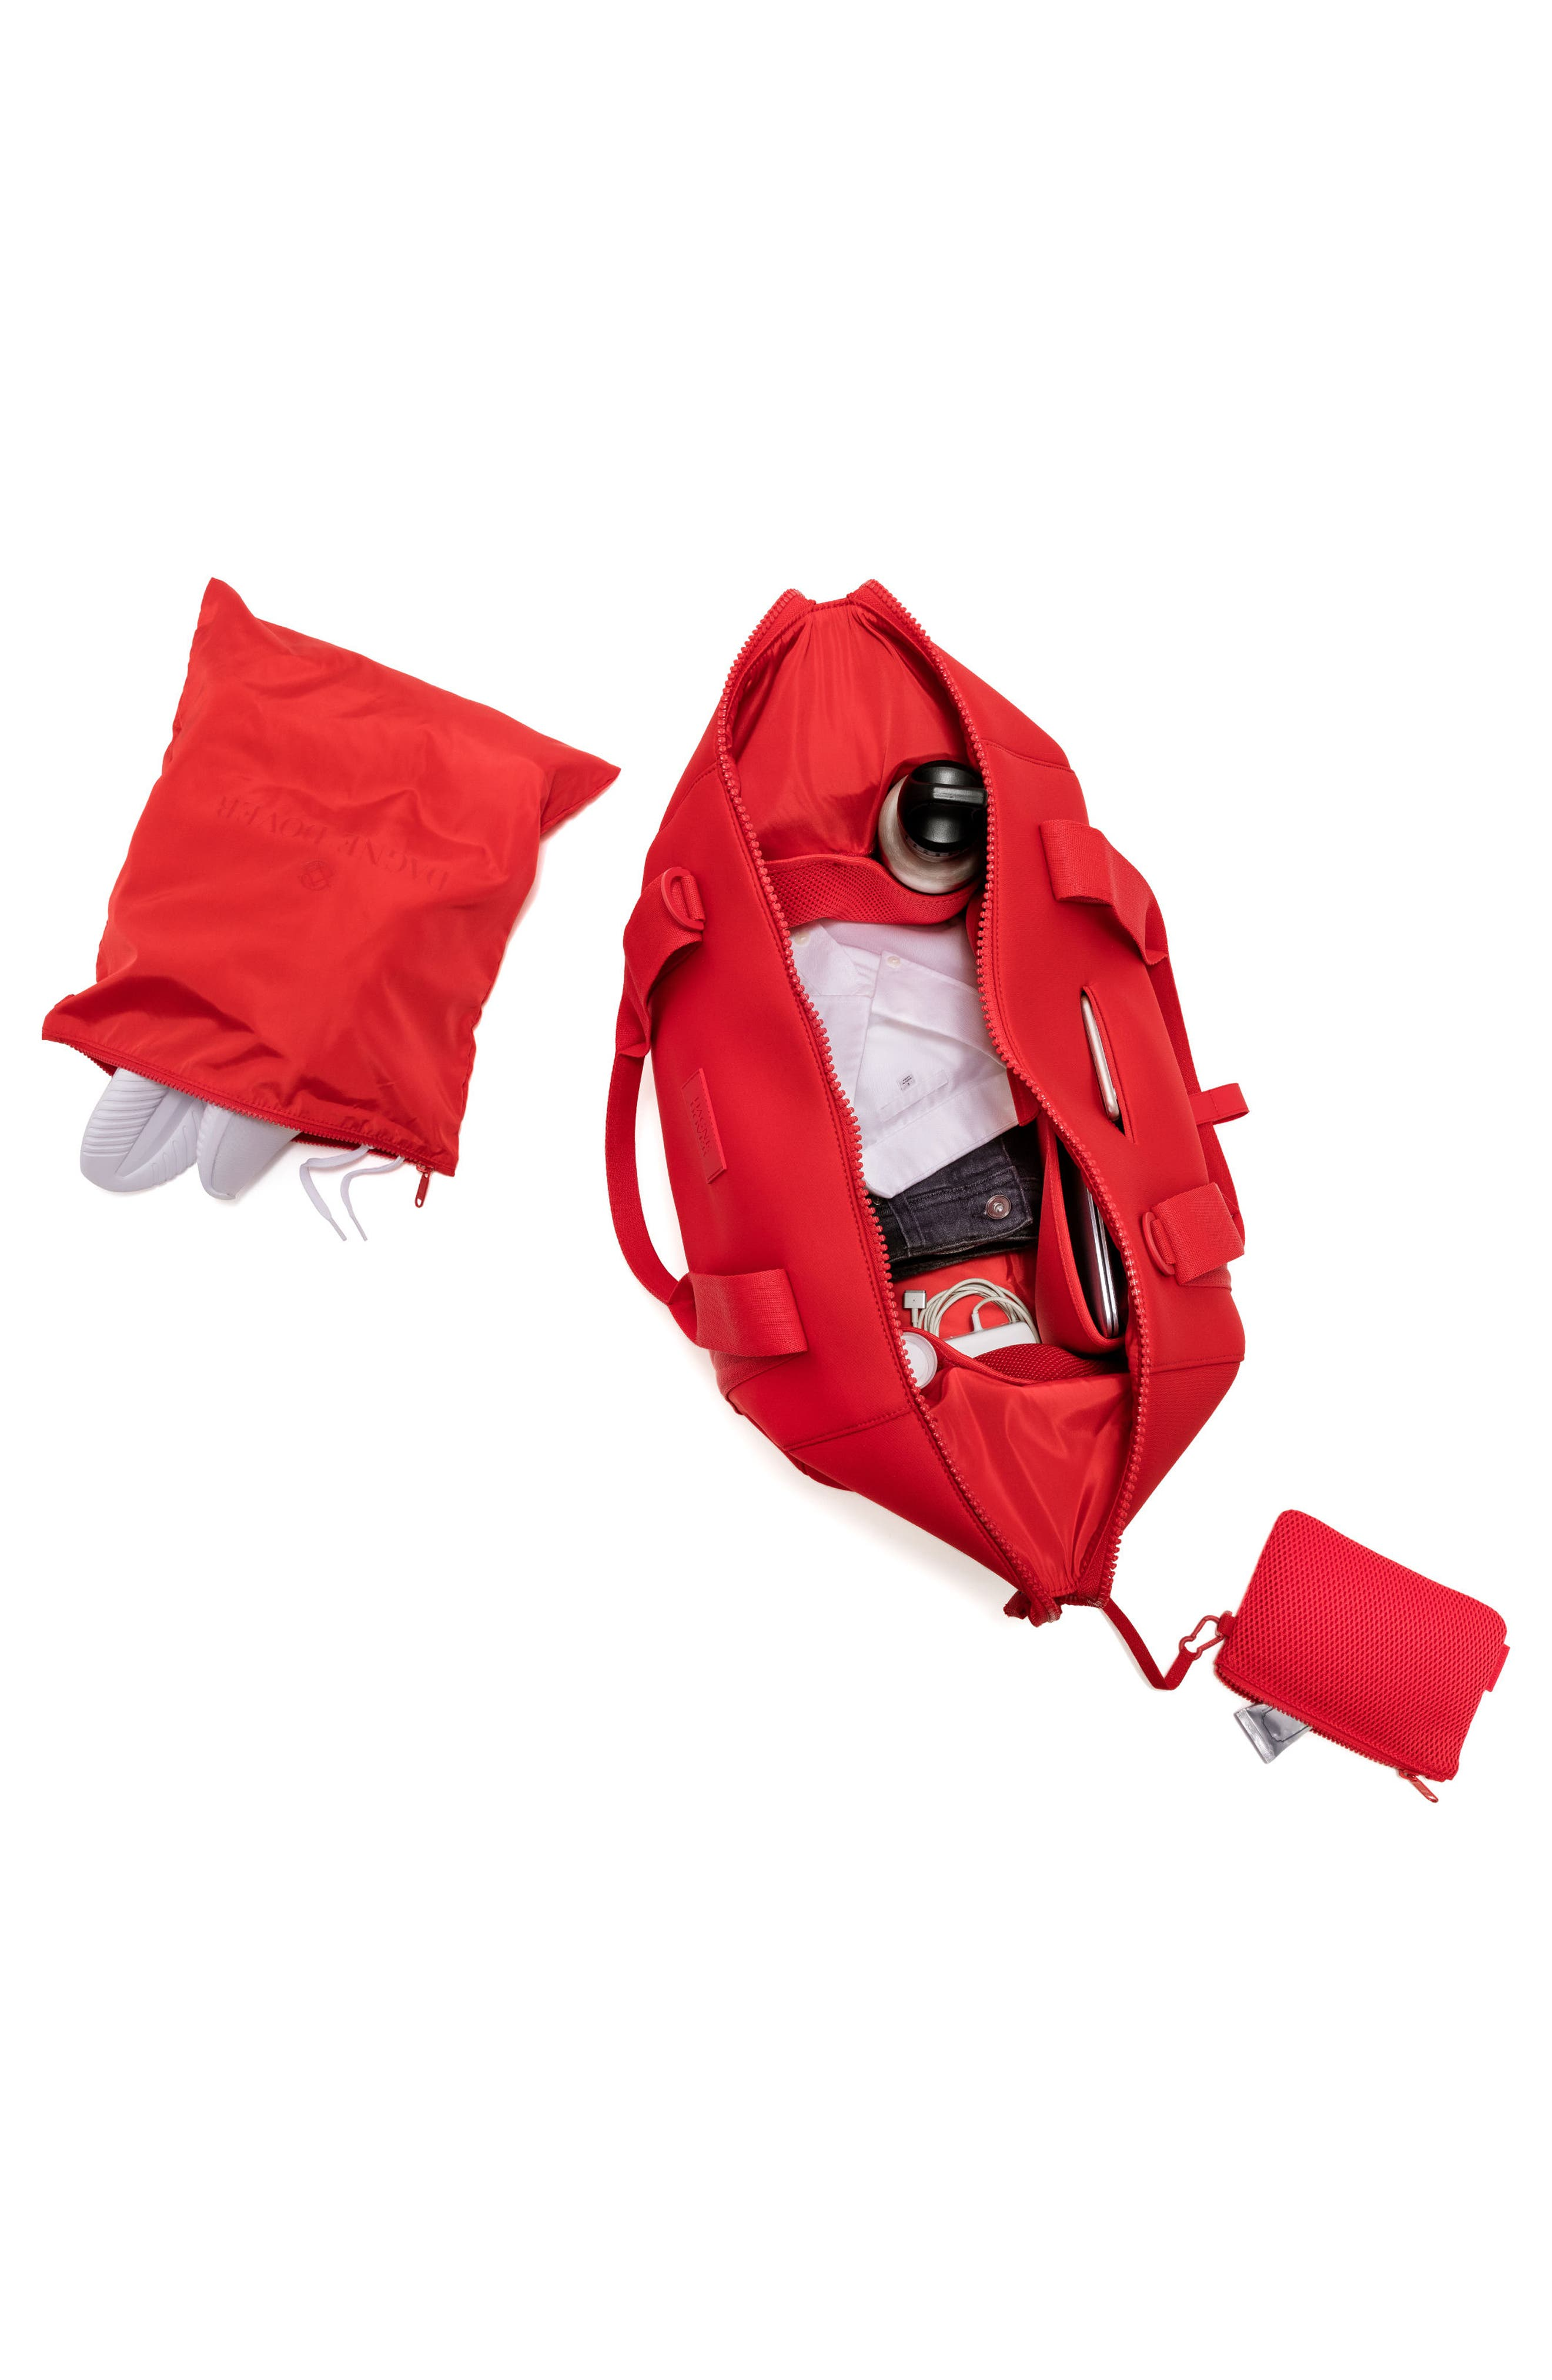 365 Large Landon Neoprene Carryall Duffel Bag,                             Alternate thumbnail 16, color,